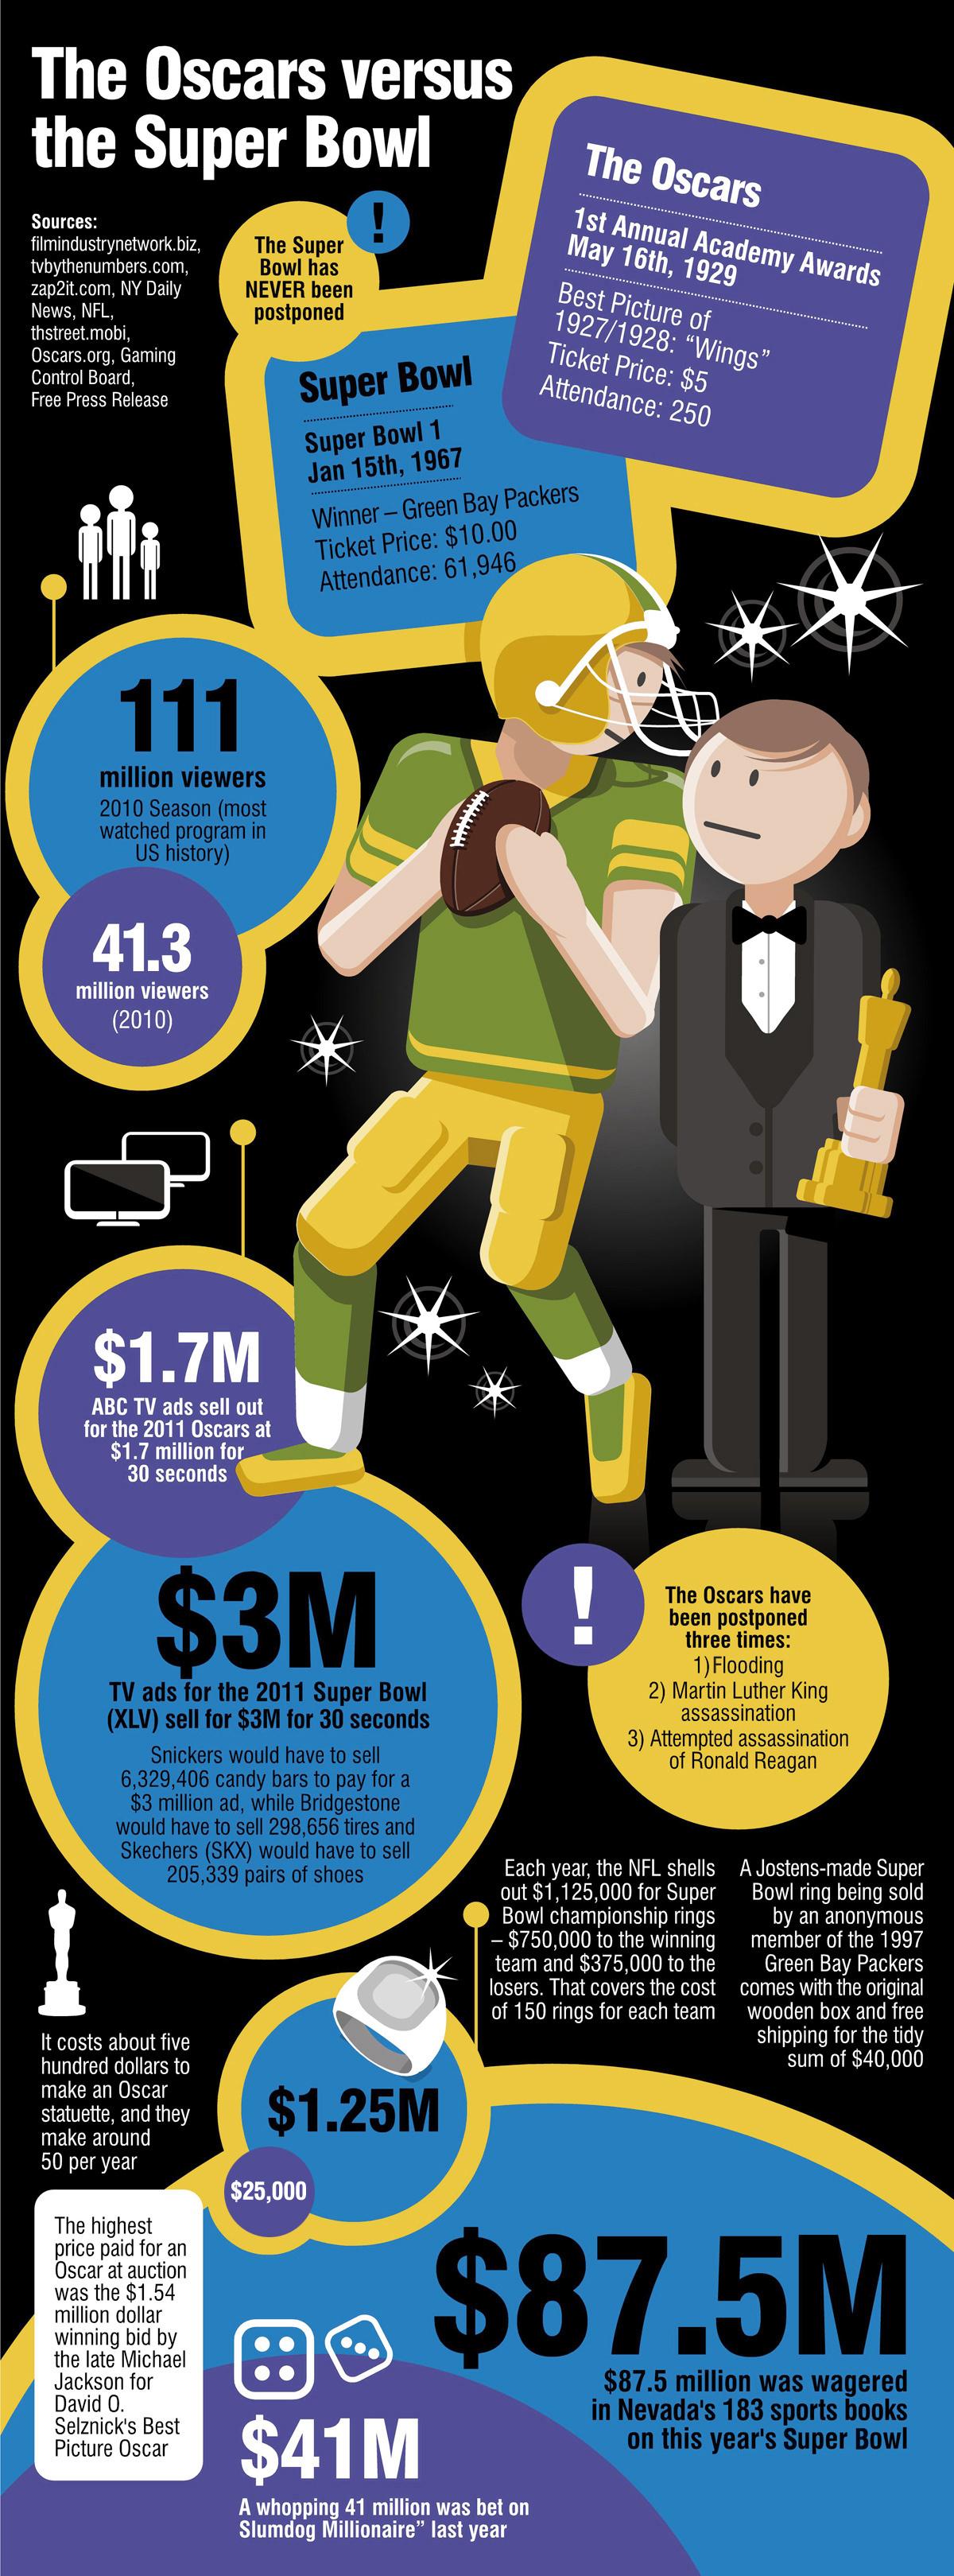 Oscars Vs Super Bowl Infographic